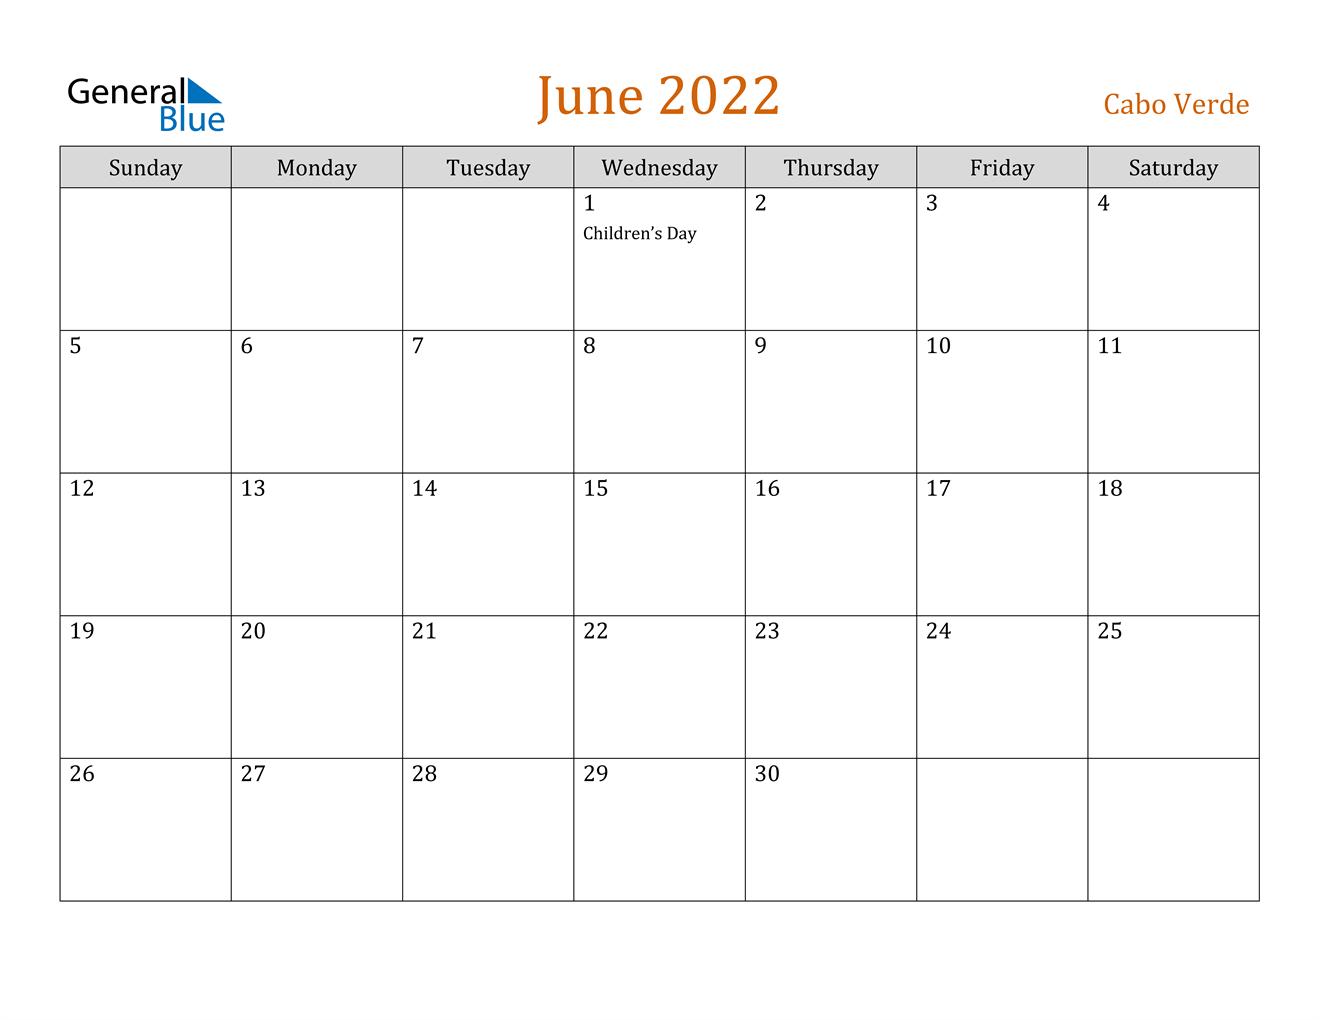 June 2022 Calendar - Cabo Verde